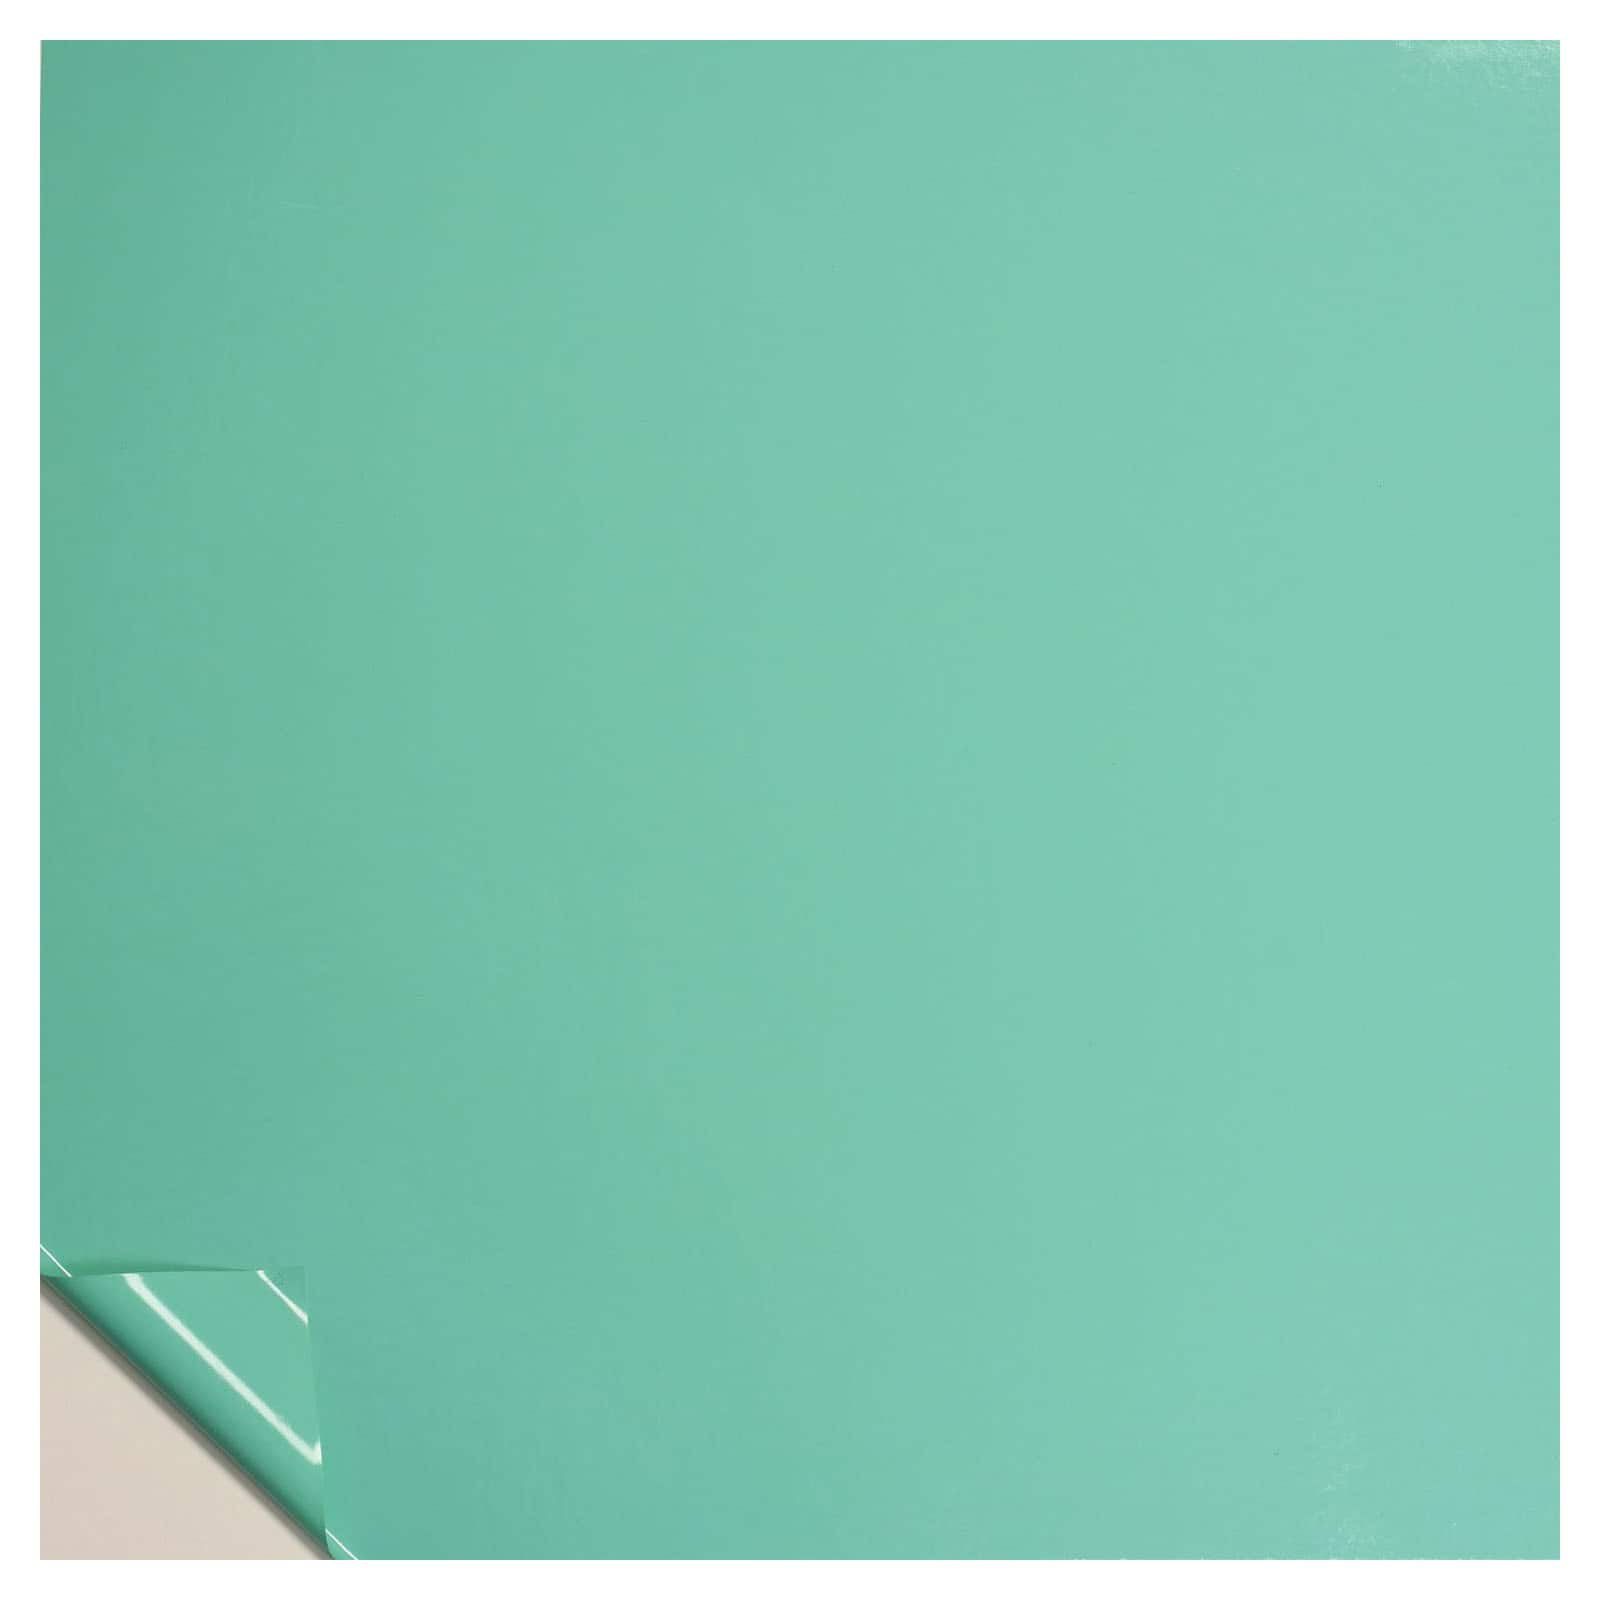 "Green Oracal 651 1 24/"" X 30/' Roll Sign Cutting Vinyl"